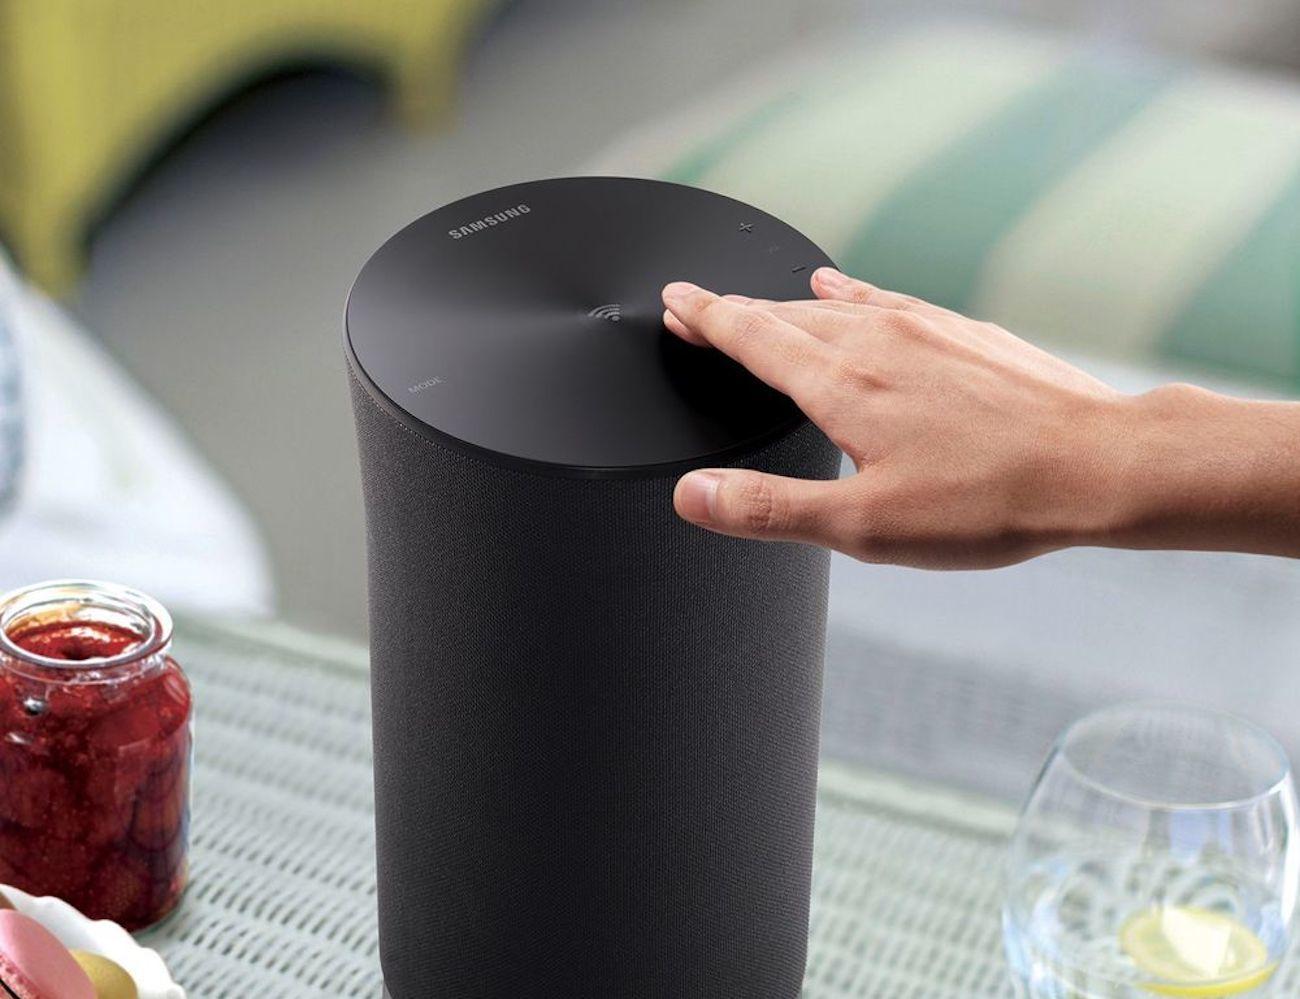 Samsung Radiant 360 R3 Wireless Speakers